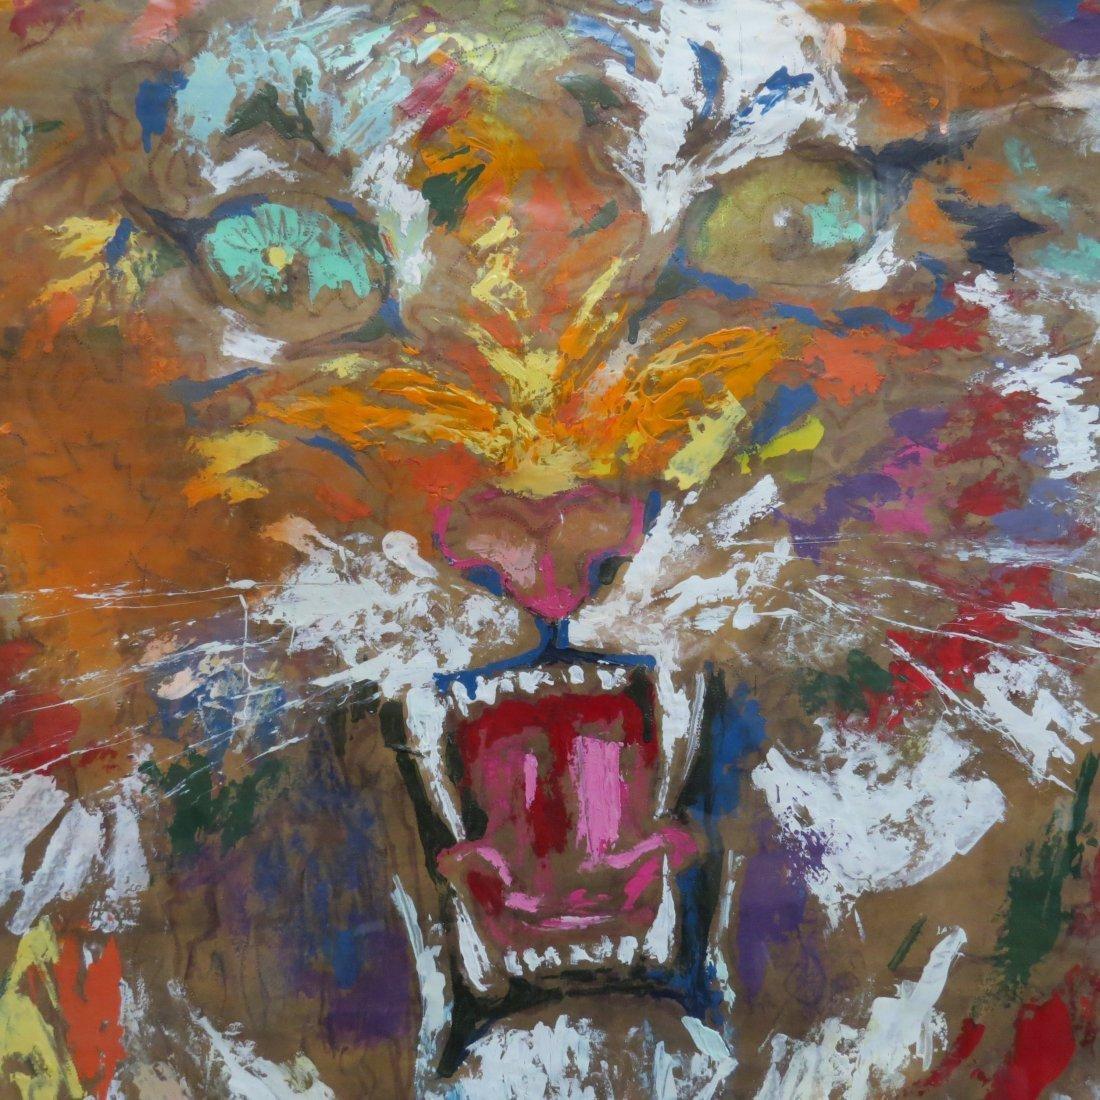 Leroy Neiman (American, 1921-2012) Tiger. - 9